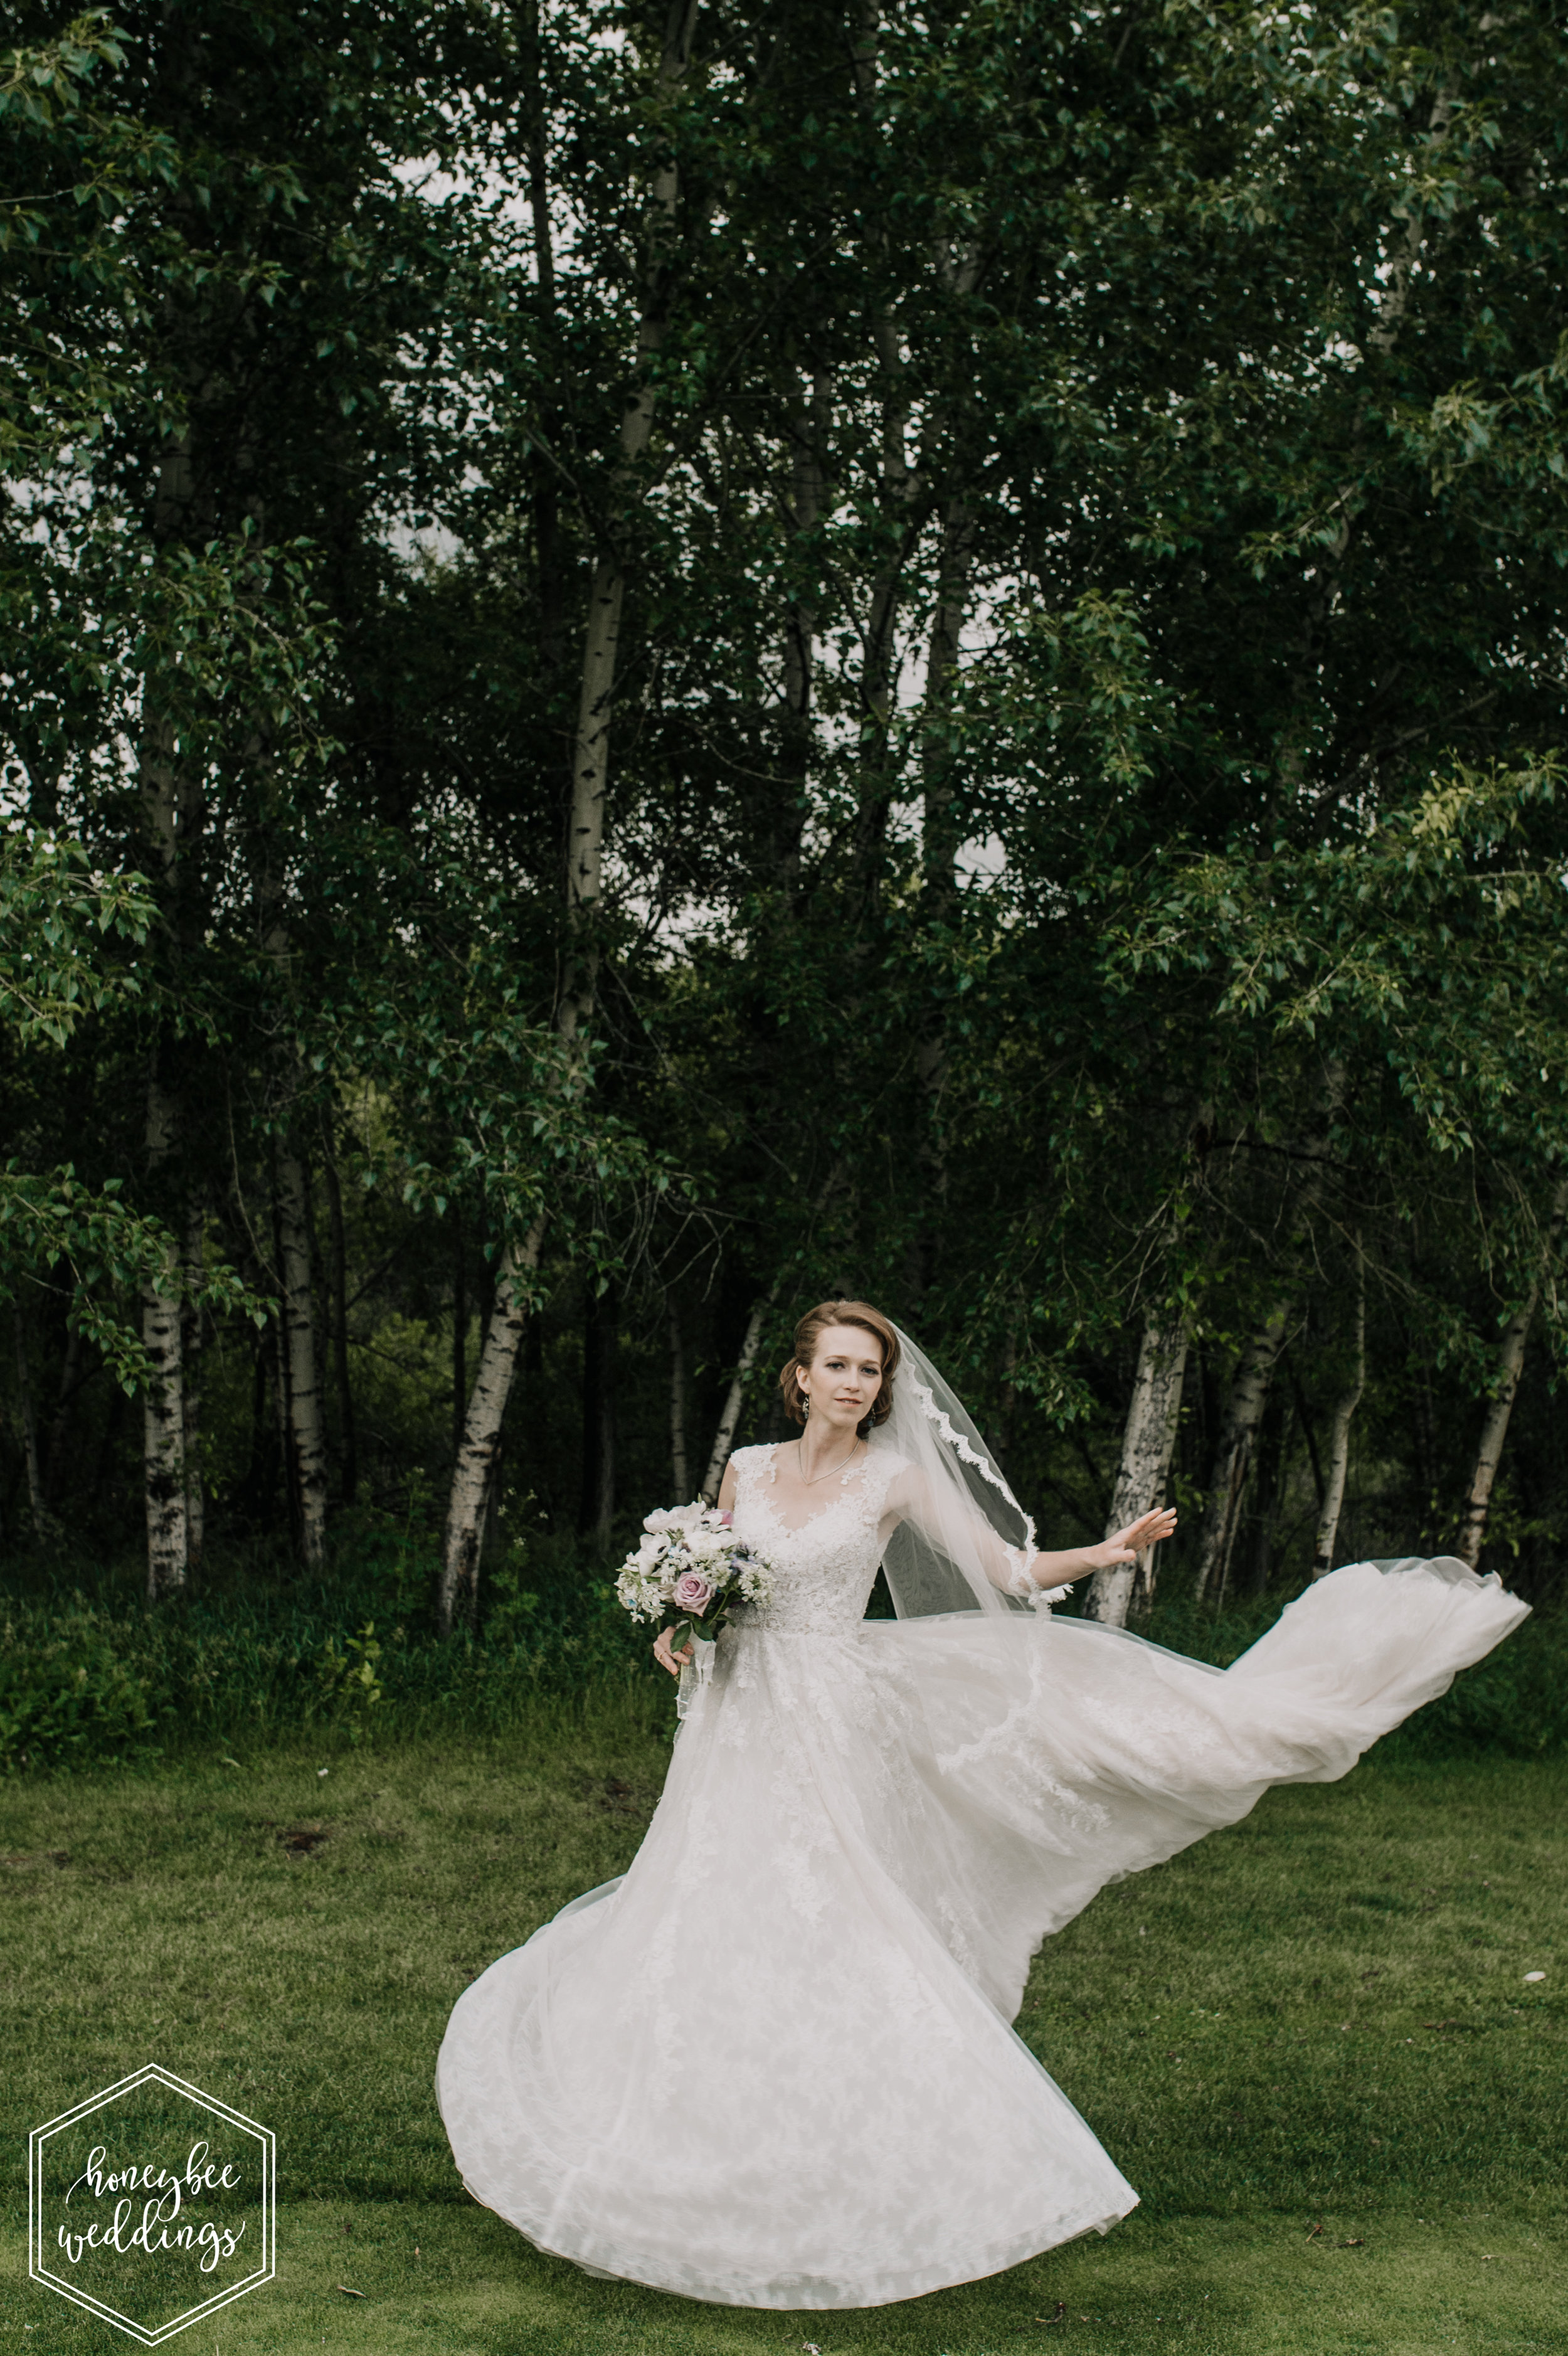 721 Riverside Country Club Wedding_Montana Wedding Photographer_Lauren Jackson + Evan Ivaldi 2018-8205.jpg